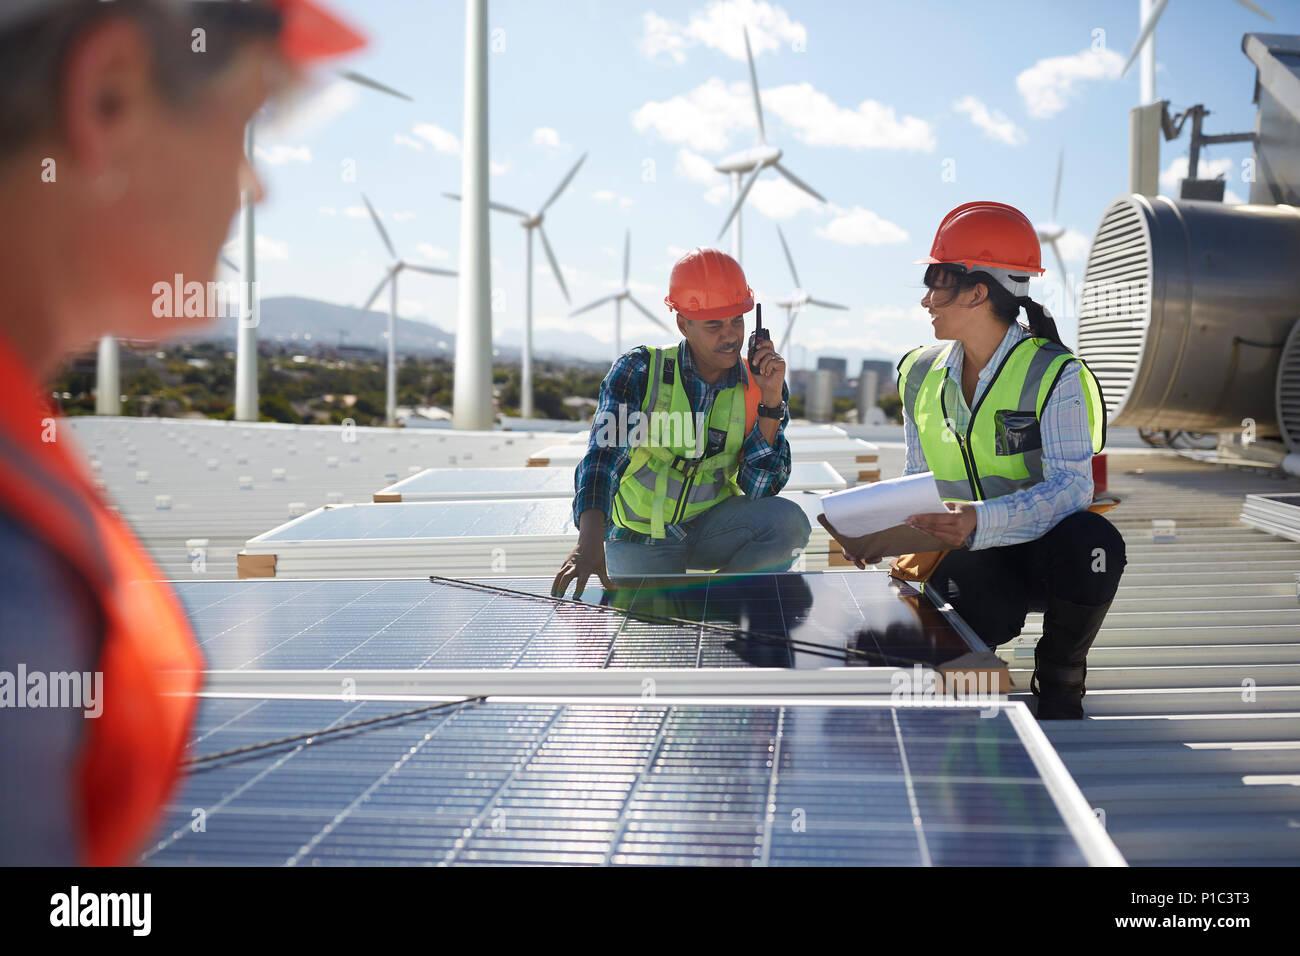 Engineers examining solar panels at alternative energy power plant - Stock Image